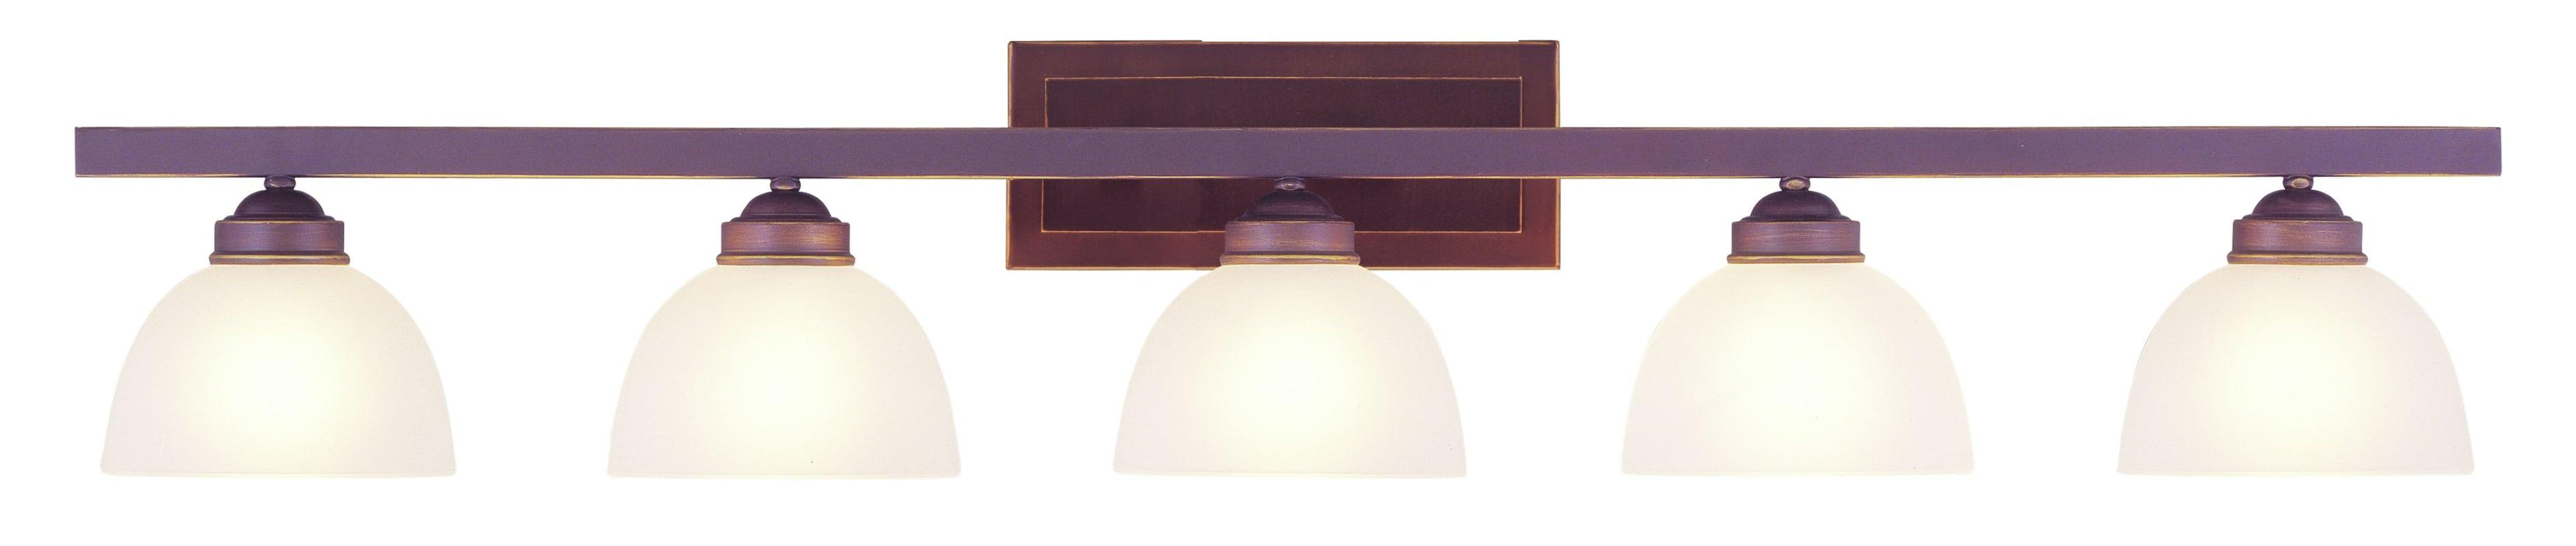 Livex Lighting 4205 70 Vintage Bronze 5 Light 500 Watt 48